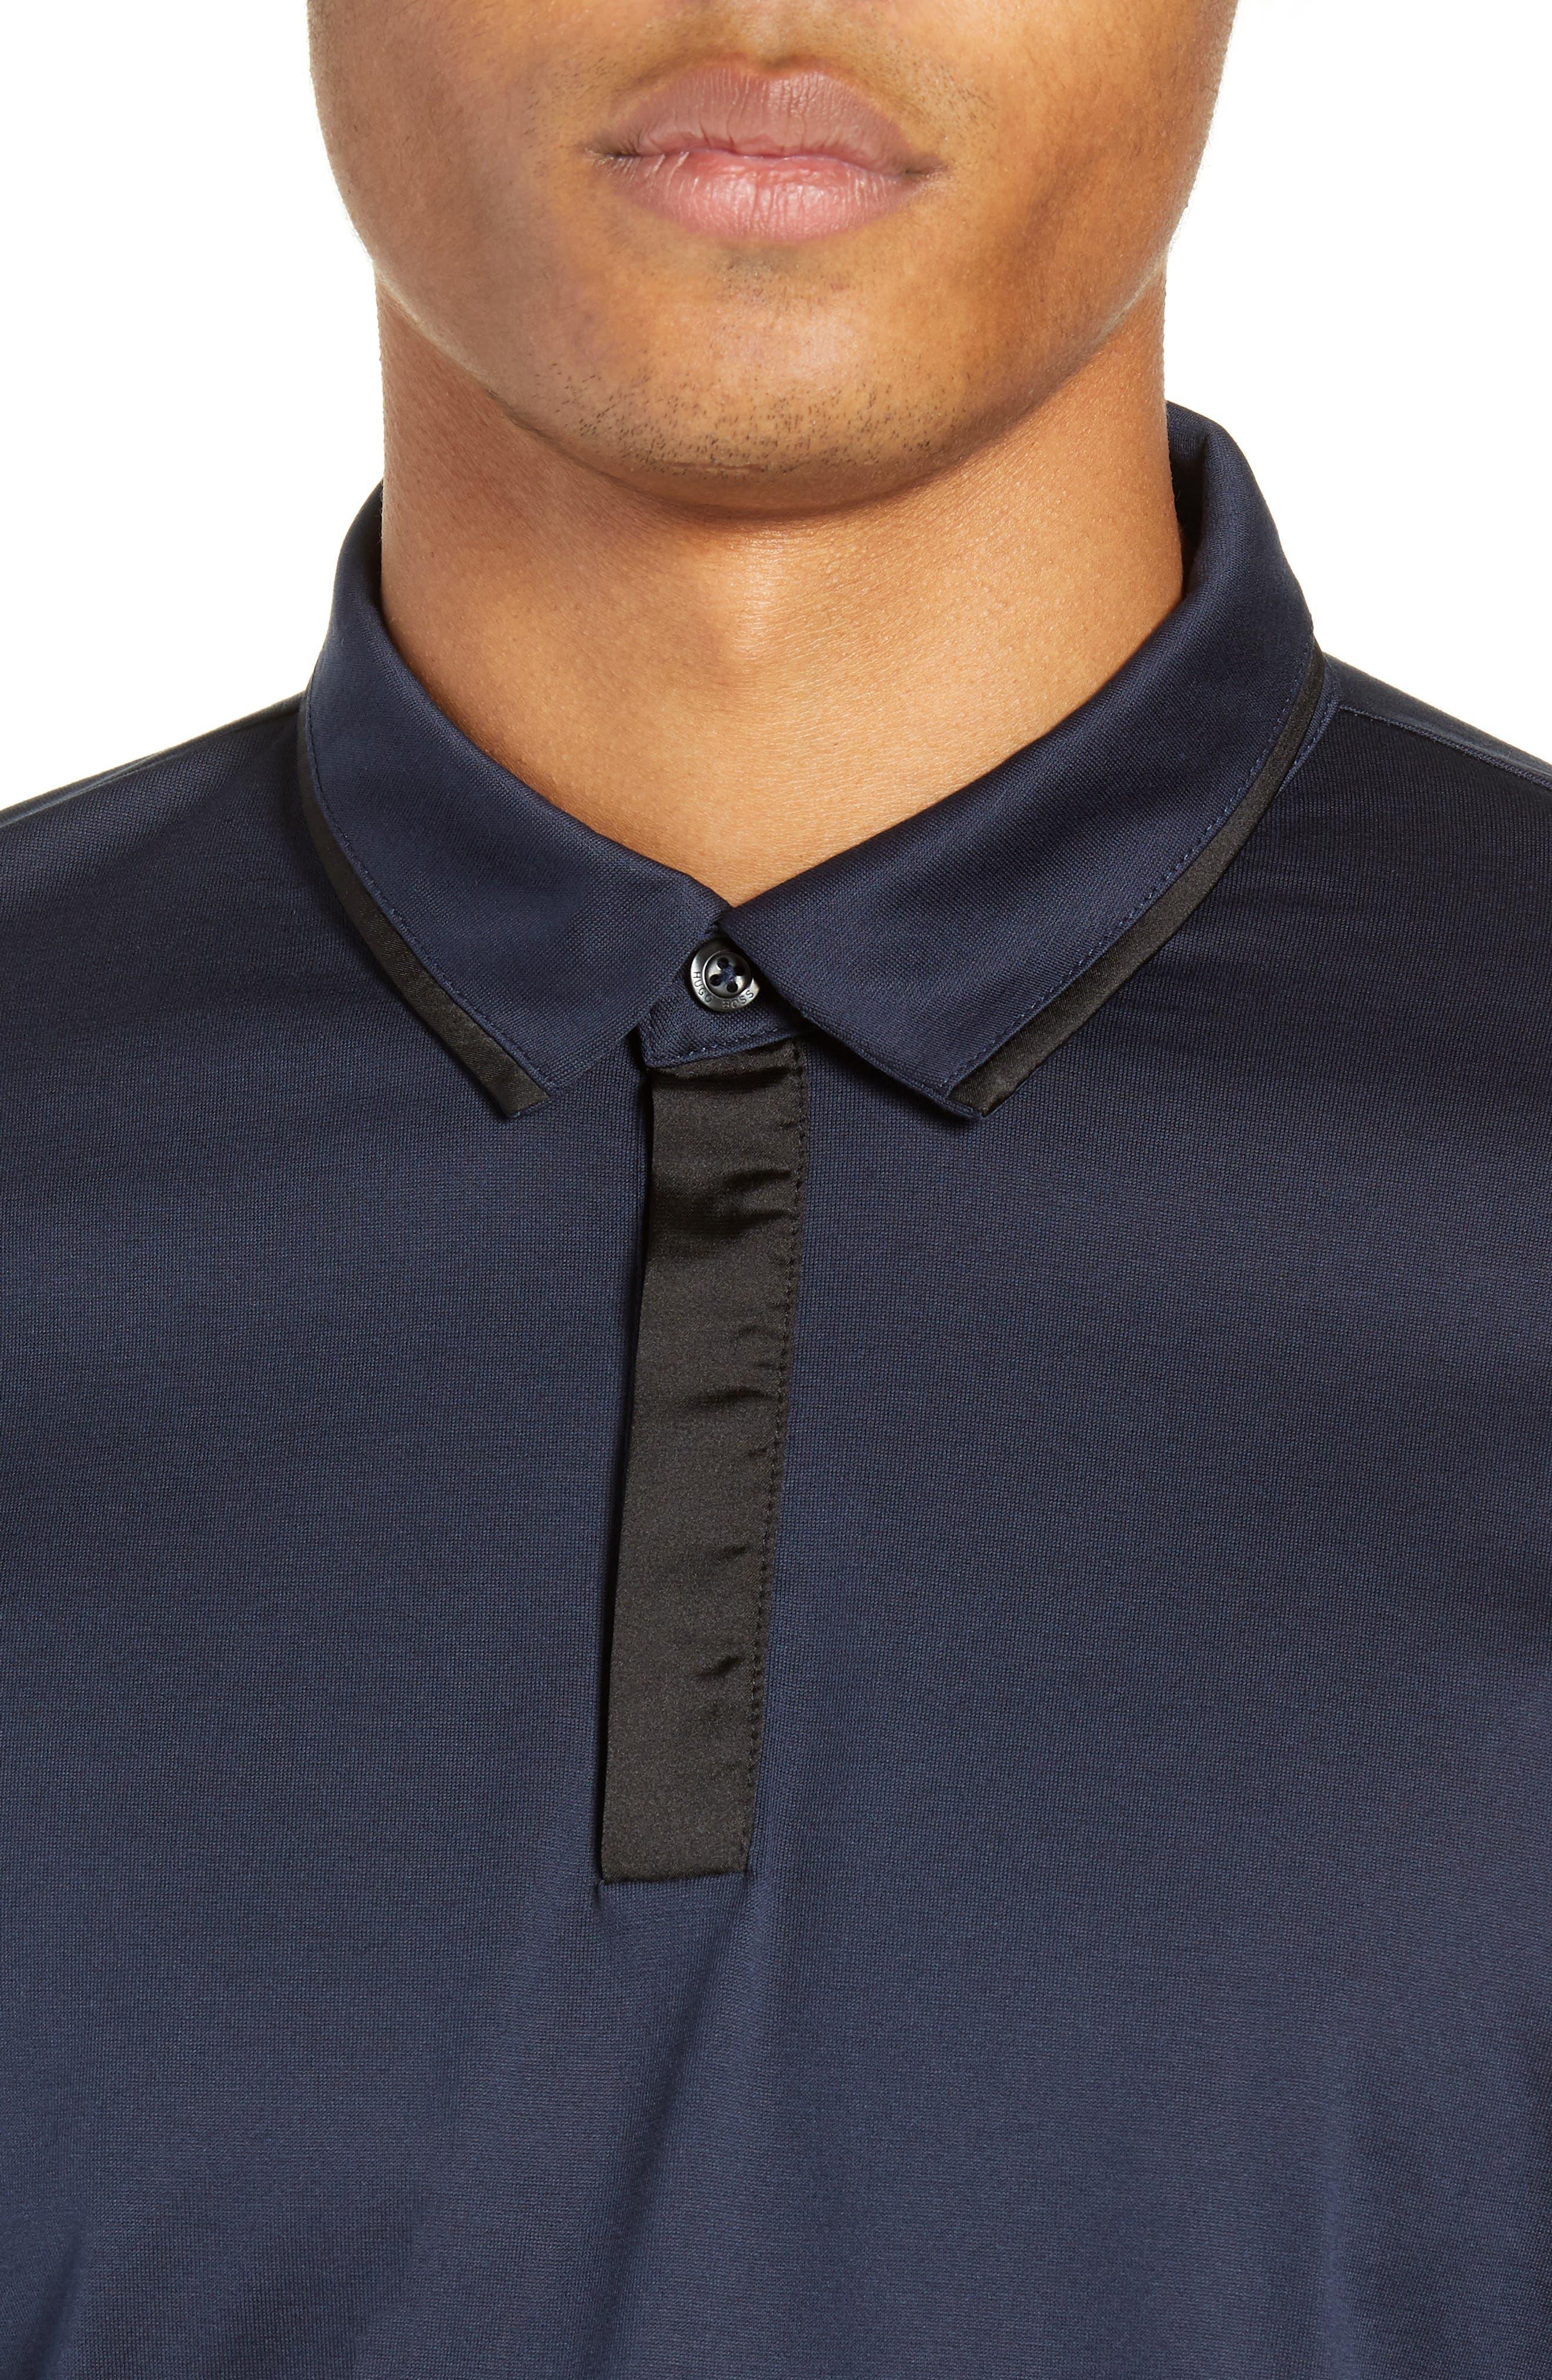 Dalendar Mercerized Cotton Slim Fit Polo Shirt,                             Alternate thumbnail 4, color,                             BLUE